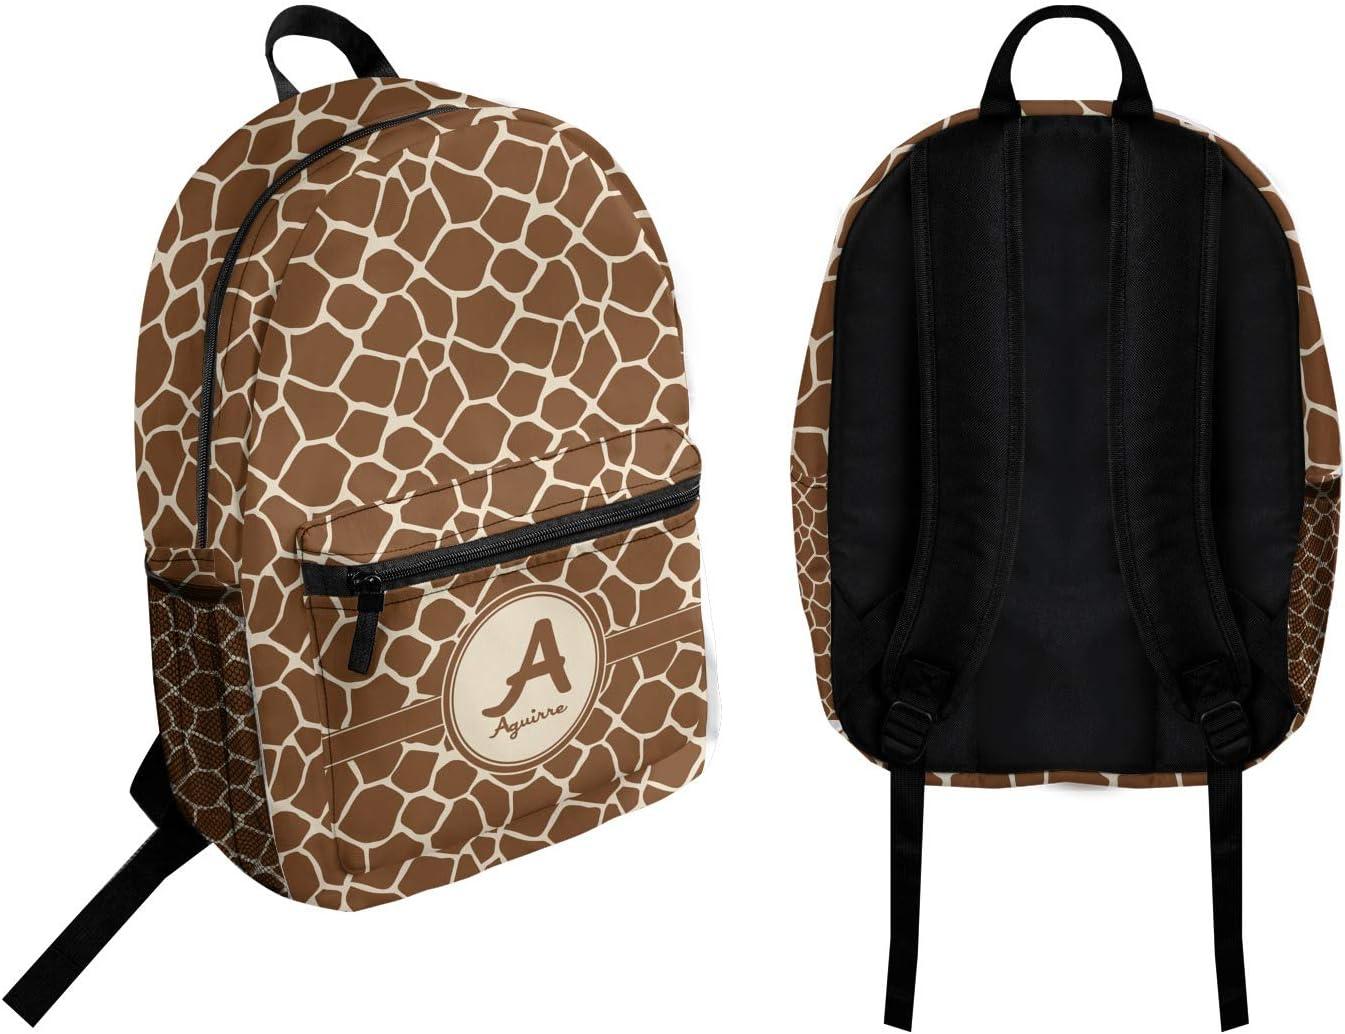 Personalized Giraffe Print Student Backpack